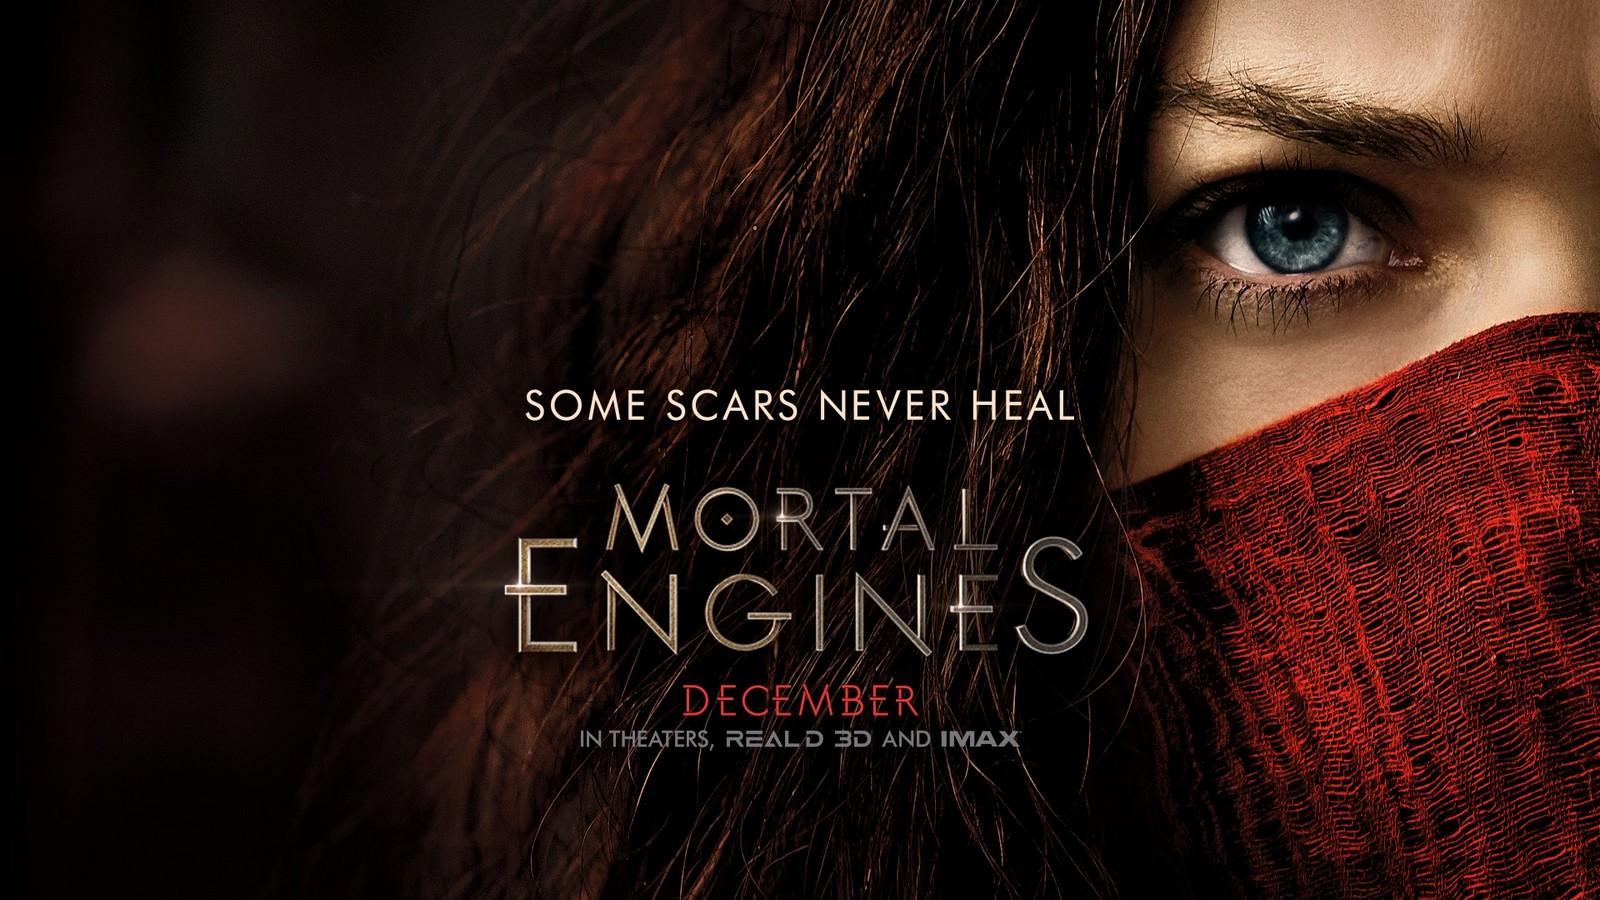 Movie, Mortal Engines(美國, 2018年) / 移動城市:致命引擎(台灣.香港) / 掠食城市(網路), 電影海報, 美國, 橫版